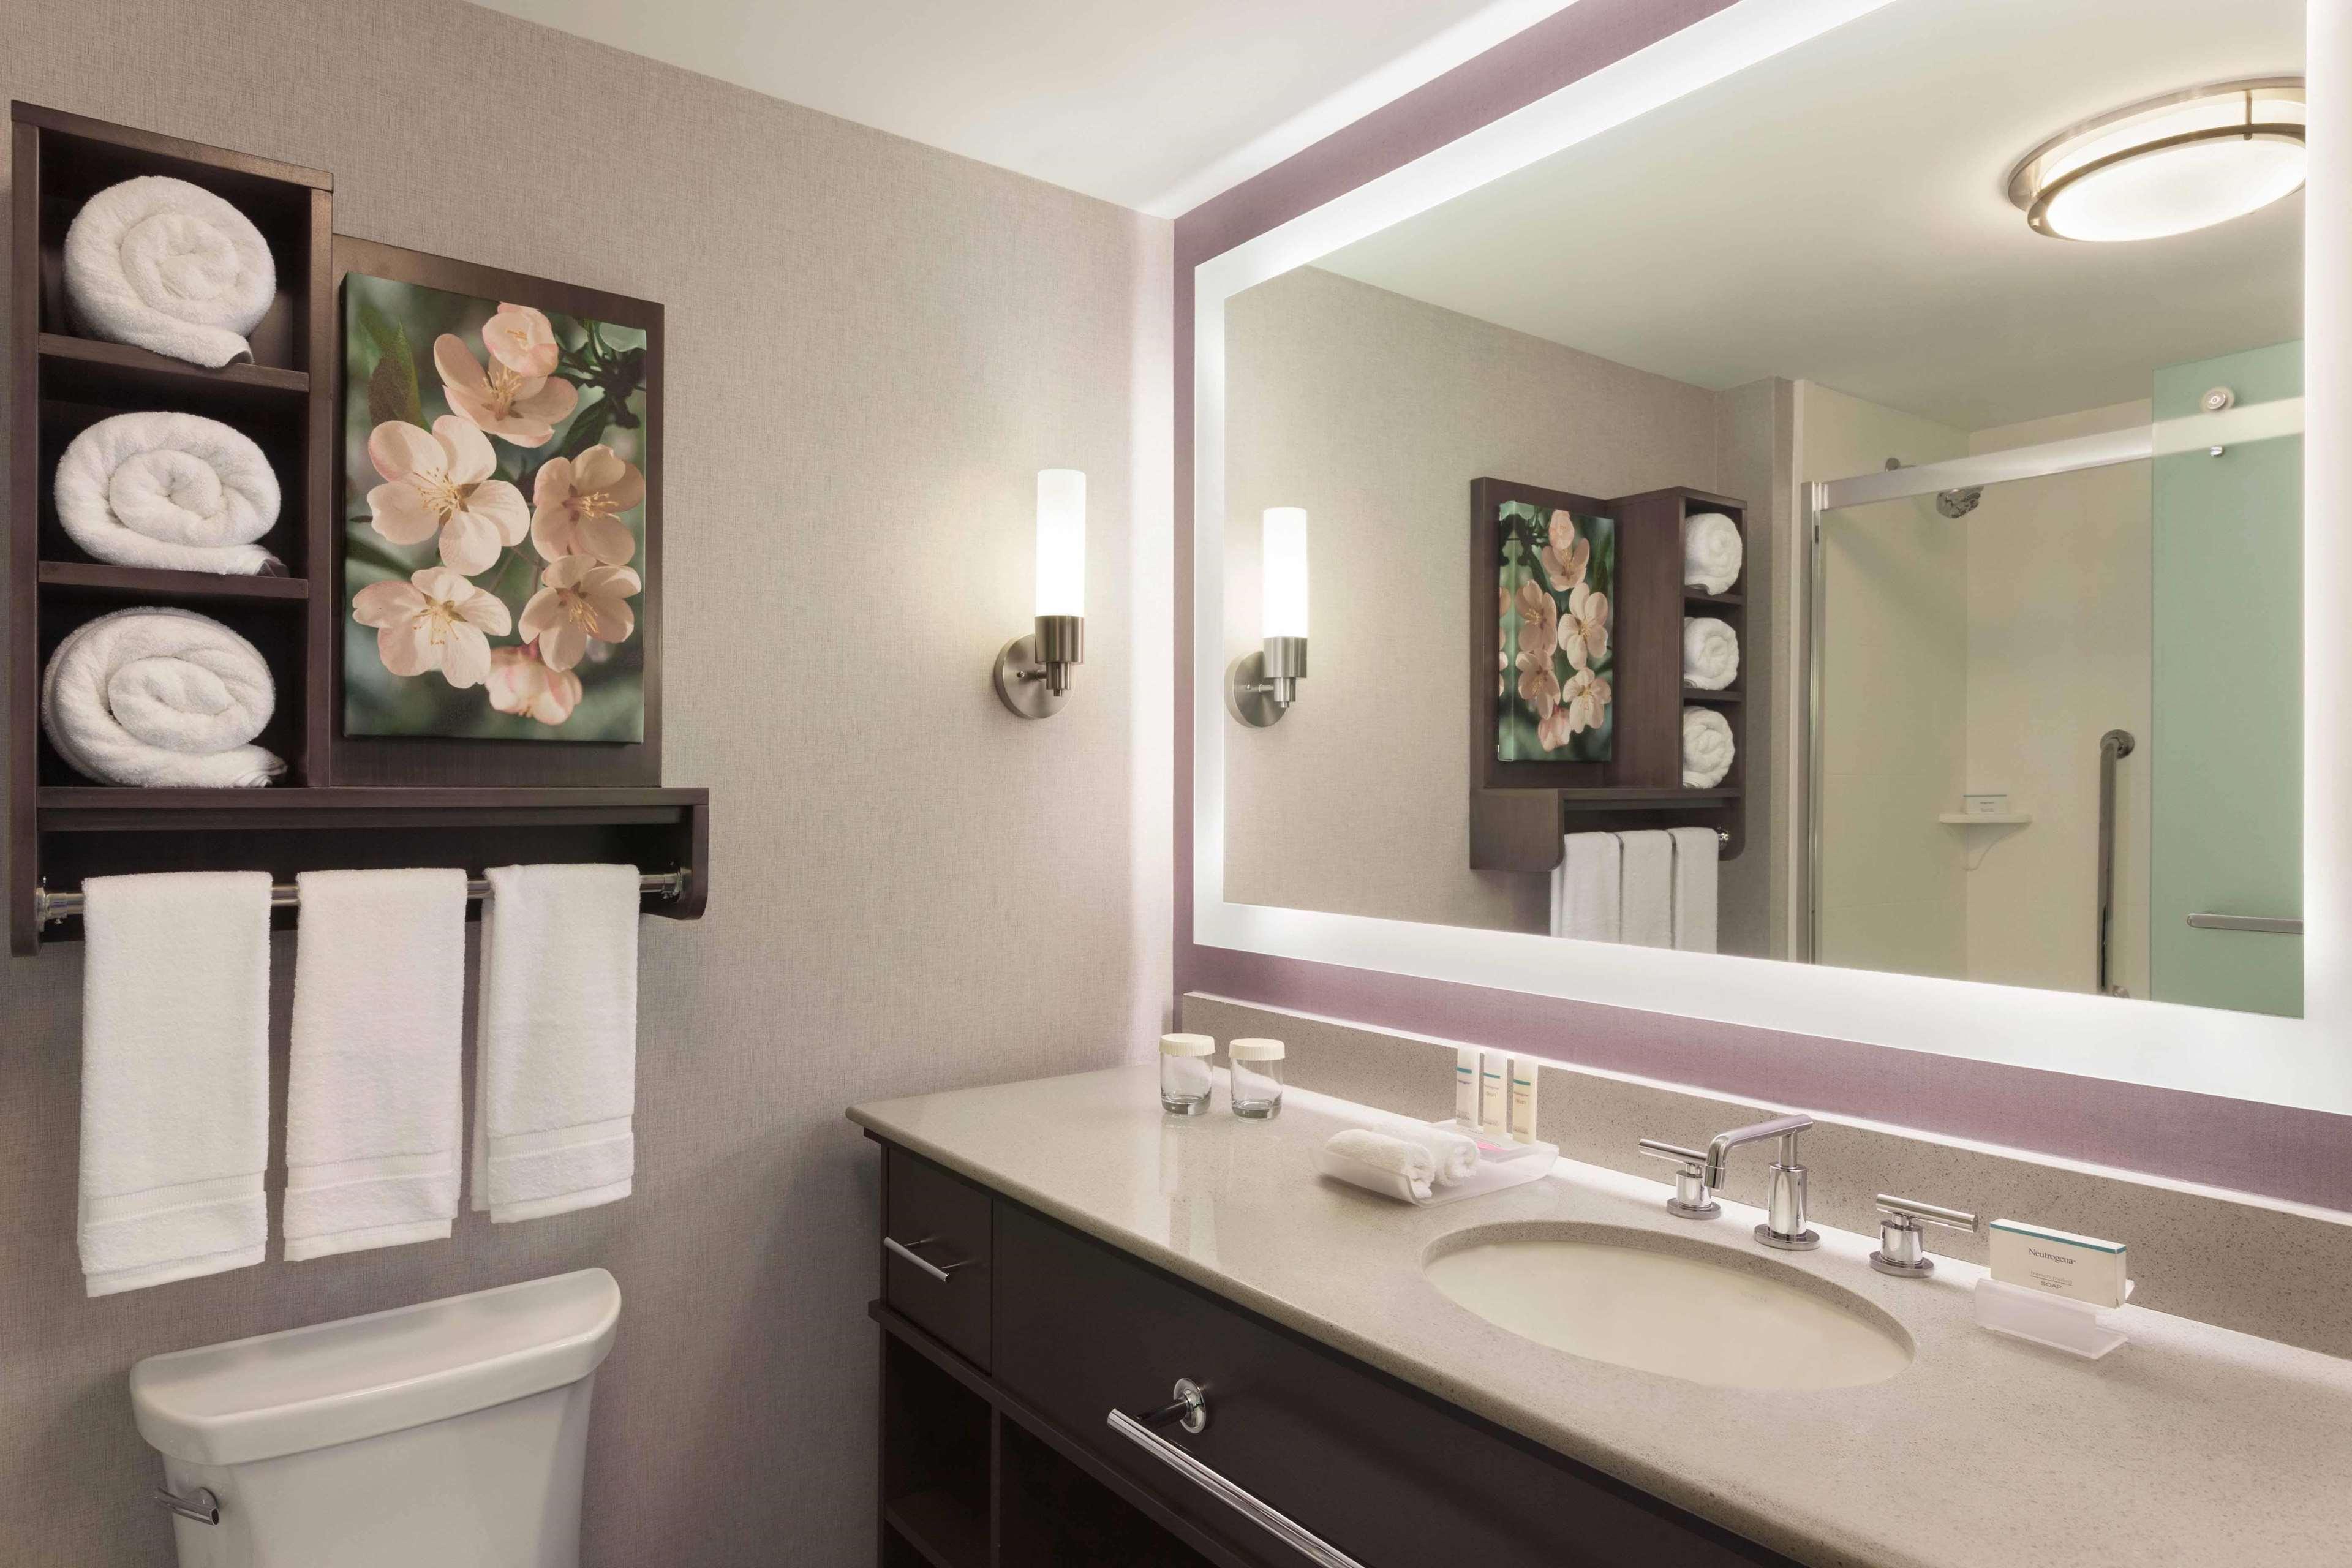 Homewood Suites by Hilton Washington DC Convention Center image 21